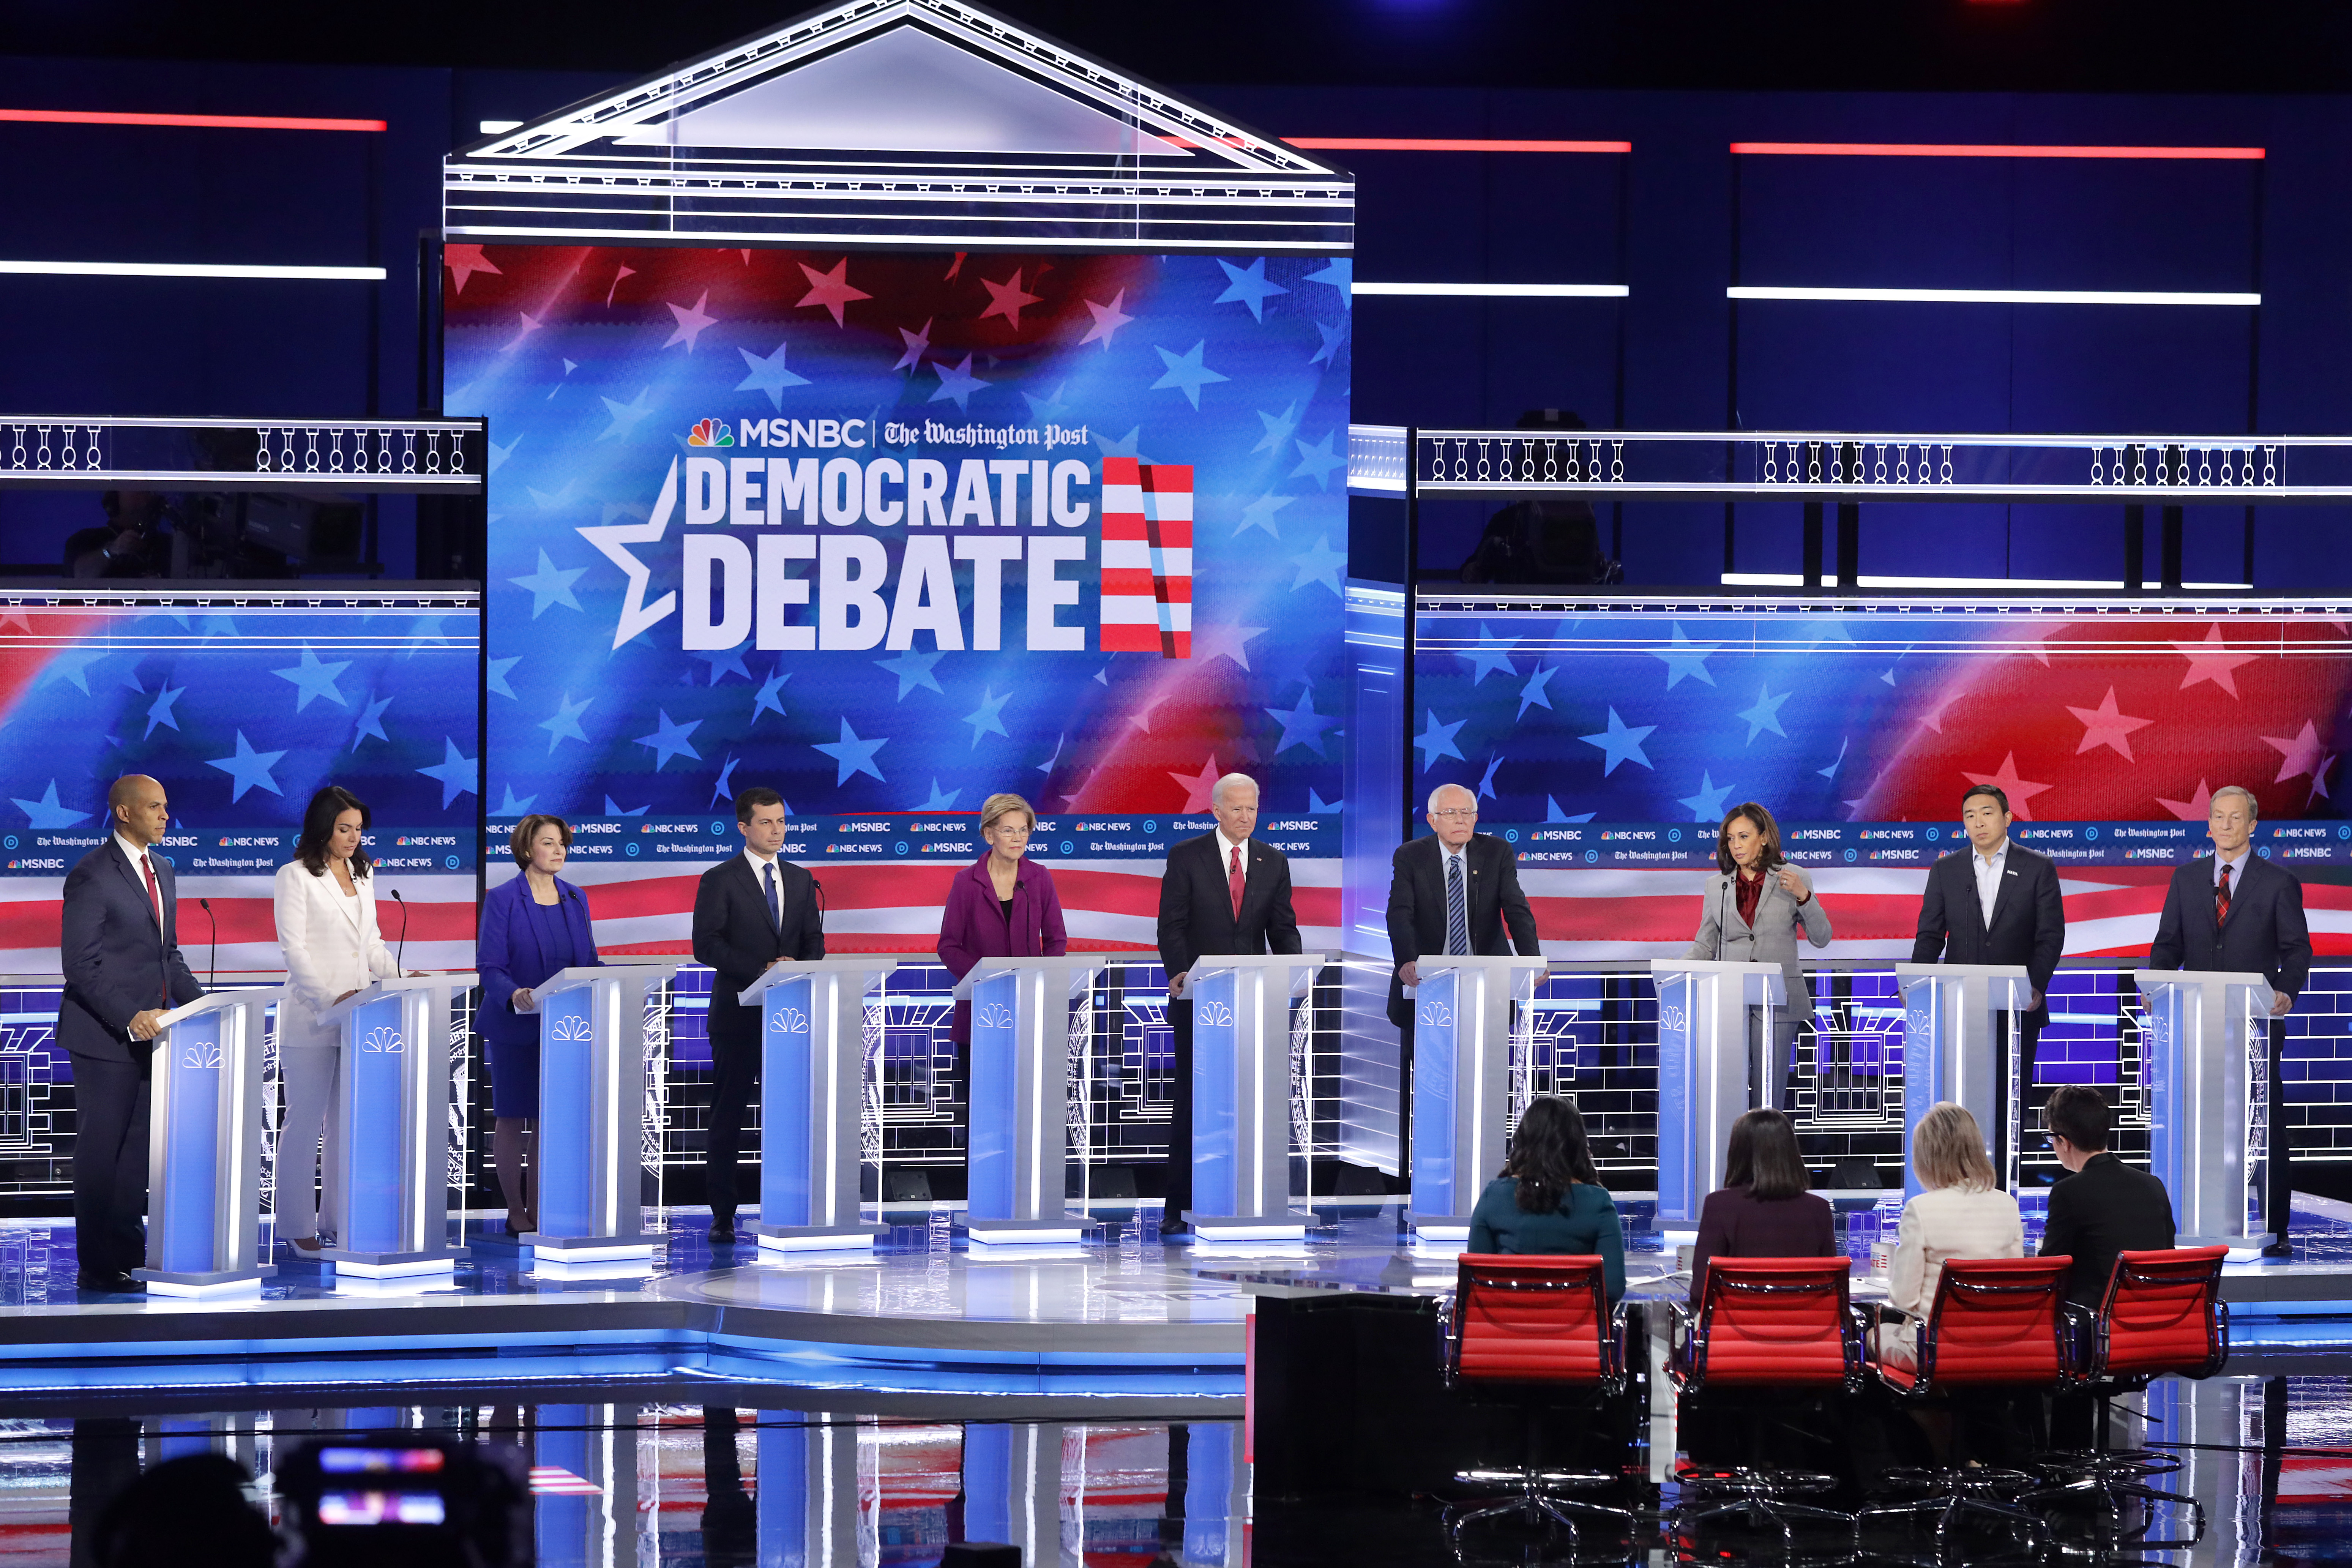 Democratic presidential candidates Sen. Cory Booker (D-NJ), Rep. Tulsi Gabbard (D-HI) , Sen. Amy Klobuchar (D-MN), South Bend, Indiana Mayor Pete Buttigieg, Sen. Elizabeth Warren (D-MA), Former Vice President Joe Biden, Sen. Bernie Sanders (I-VT), Sen. Kamala Harris (D-CA), Andrew Yang, and Tom Steyer participate in the fifth Democratic Presidential Debate. (Alex Wong/Getty Images)